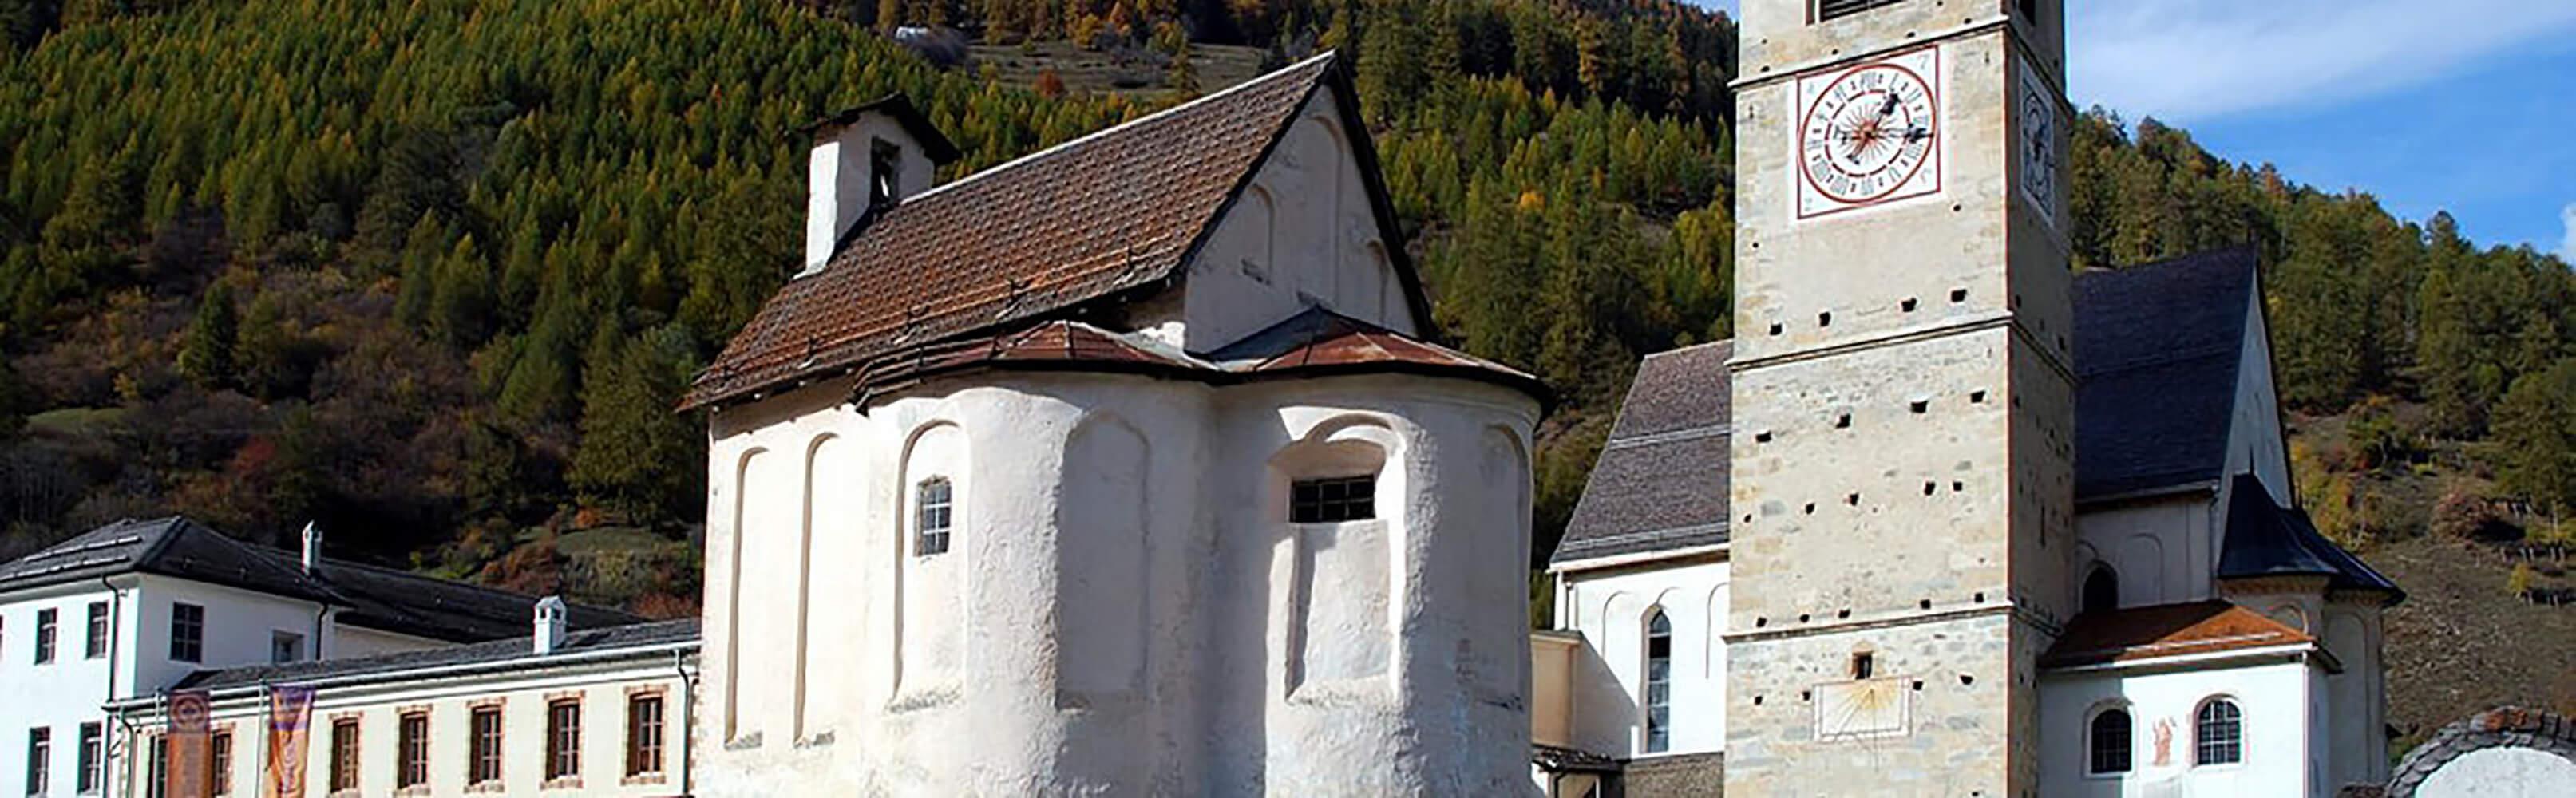 Benediktinerkloster St. Johann 1